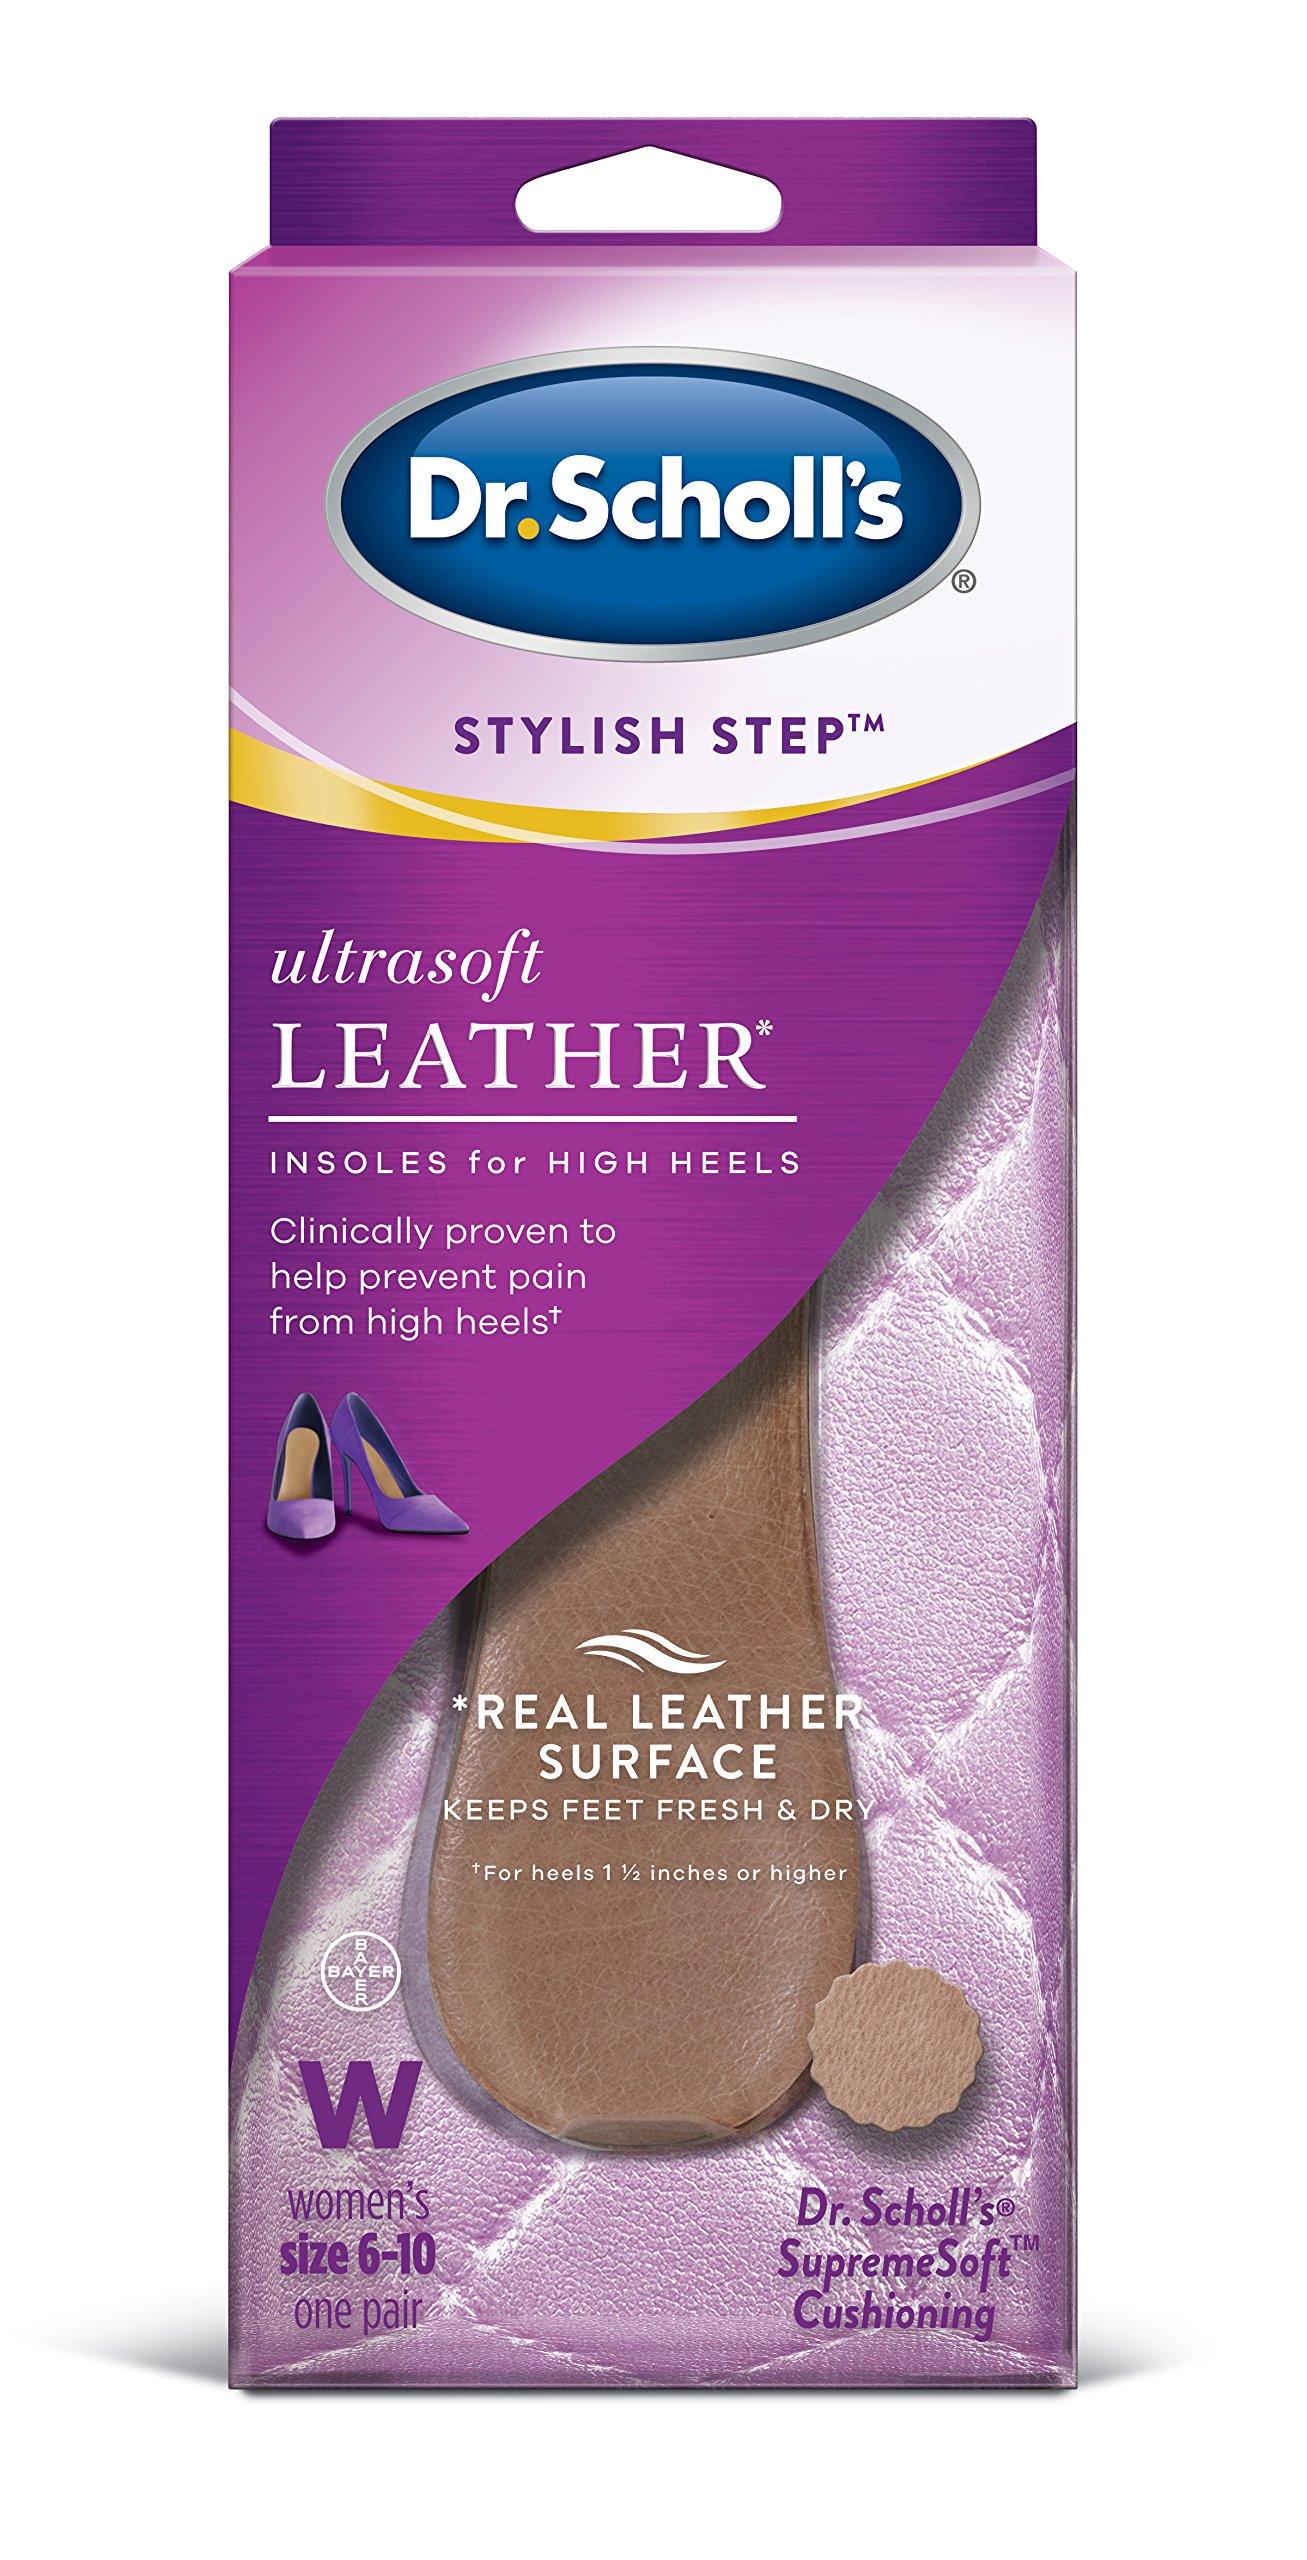 8fad476eef Dr. Scholl's Ultrasoft Leather Insoles for High Heels (Women's 6-10) /